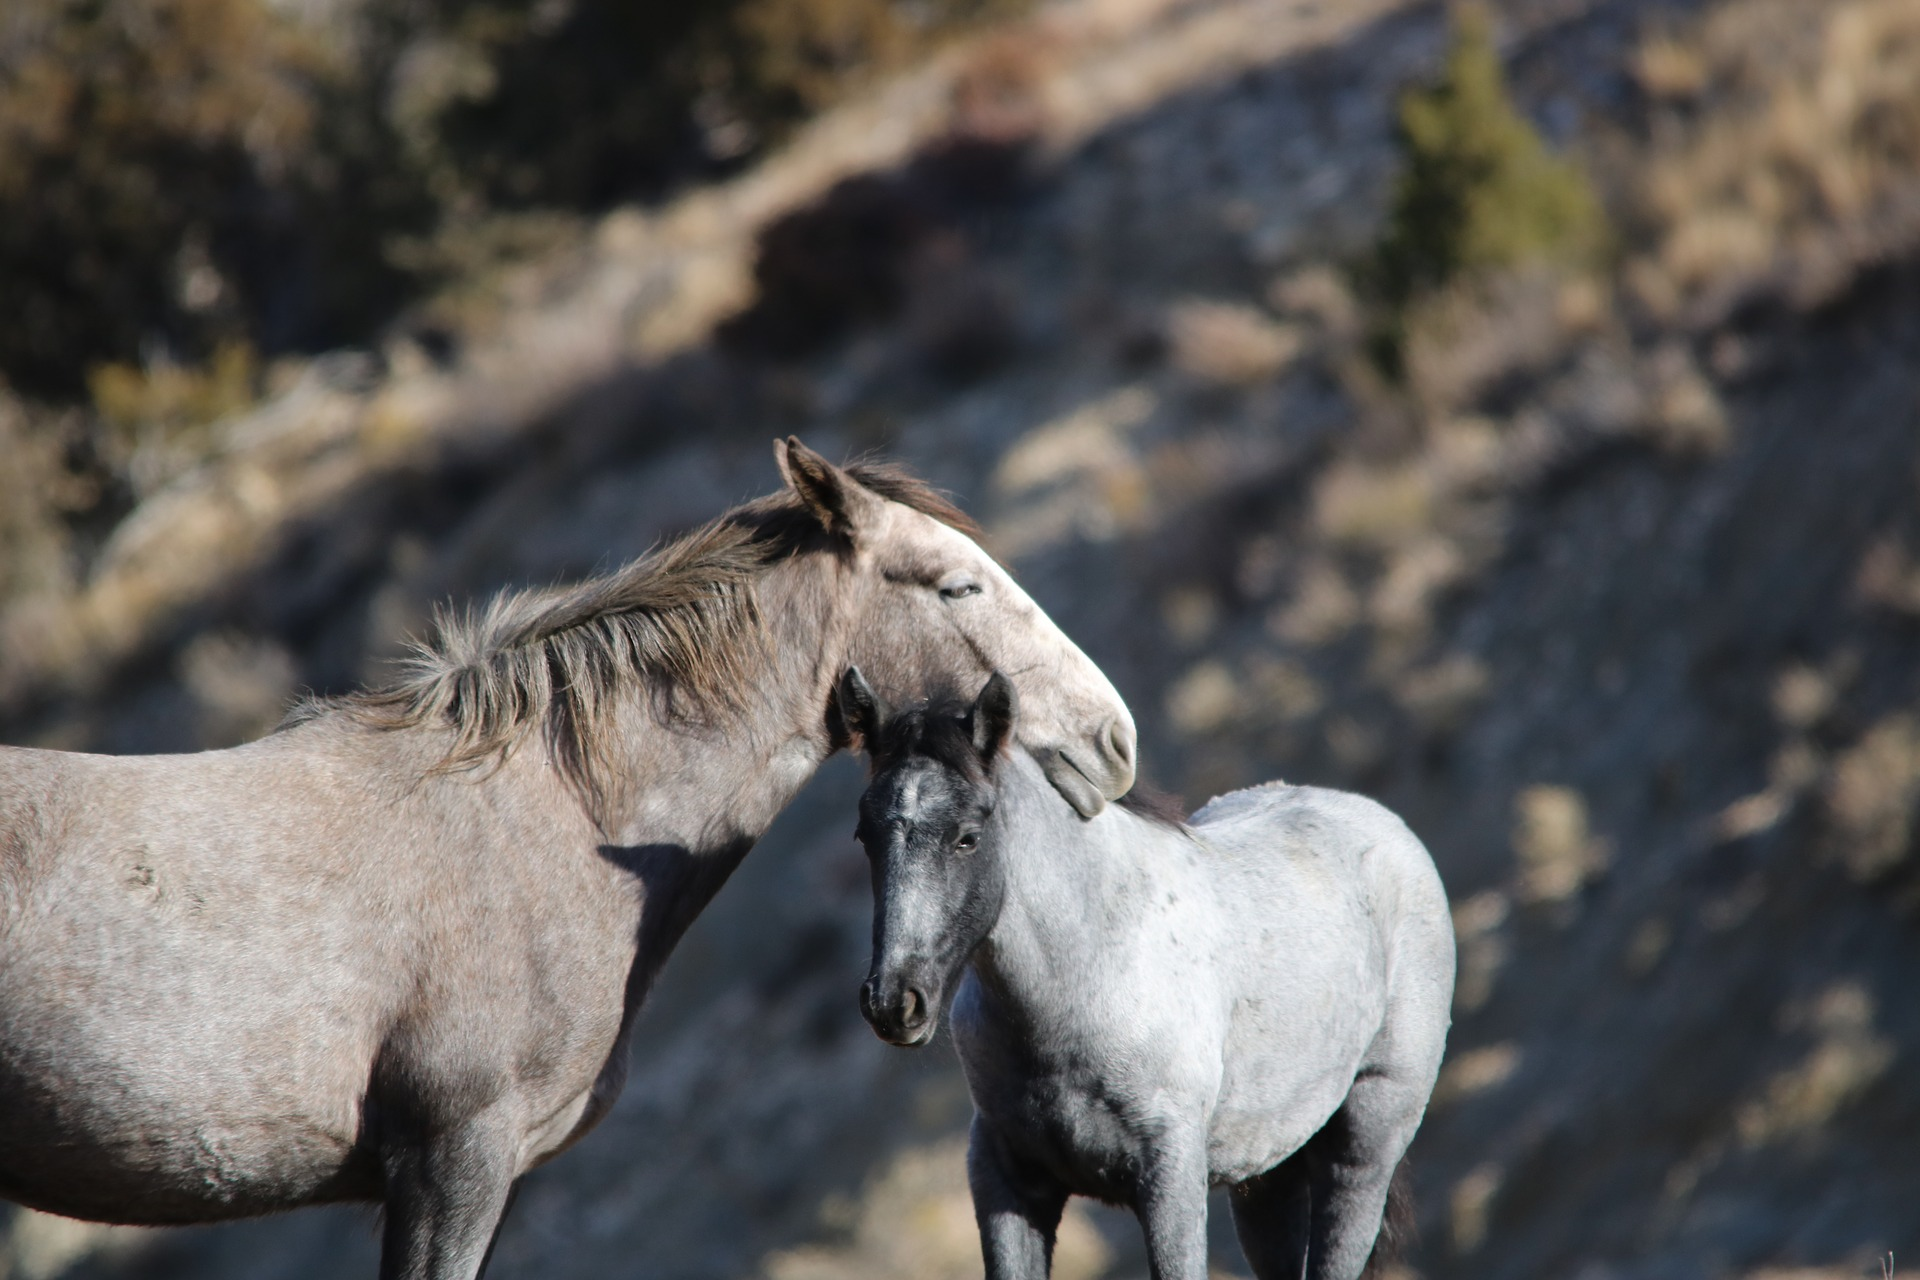 Wild Horses, Theodor Roosevelt National Park, North Dakota